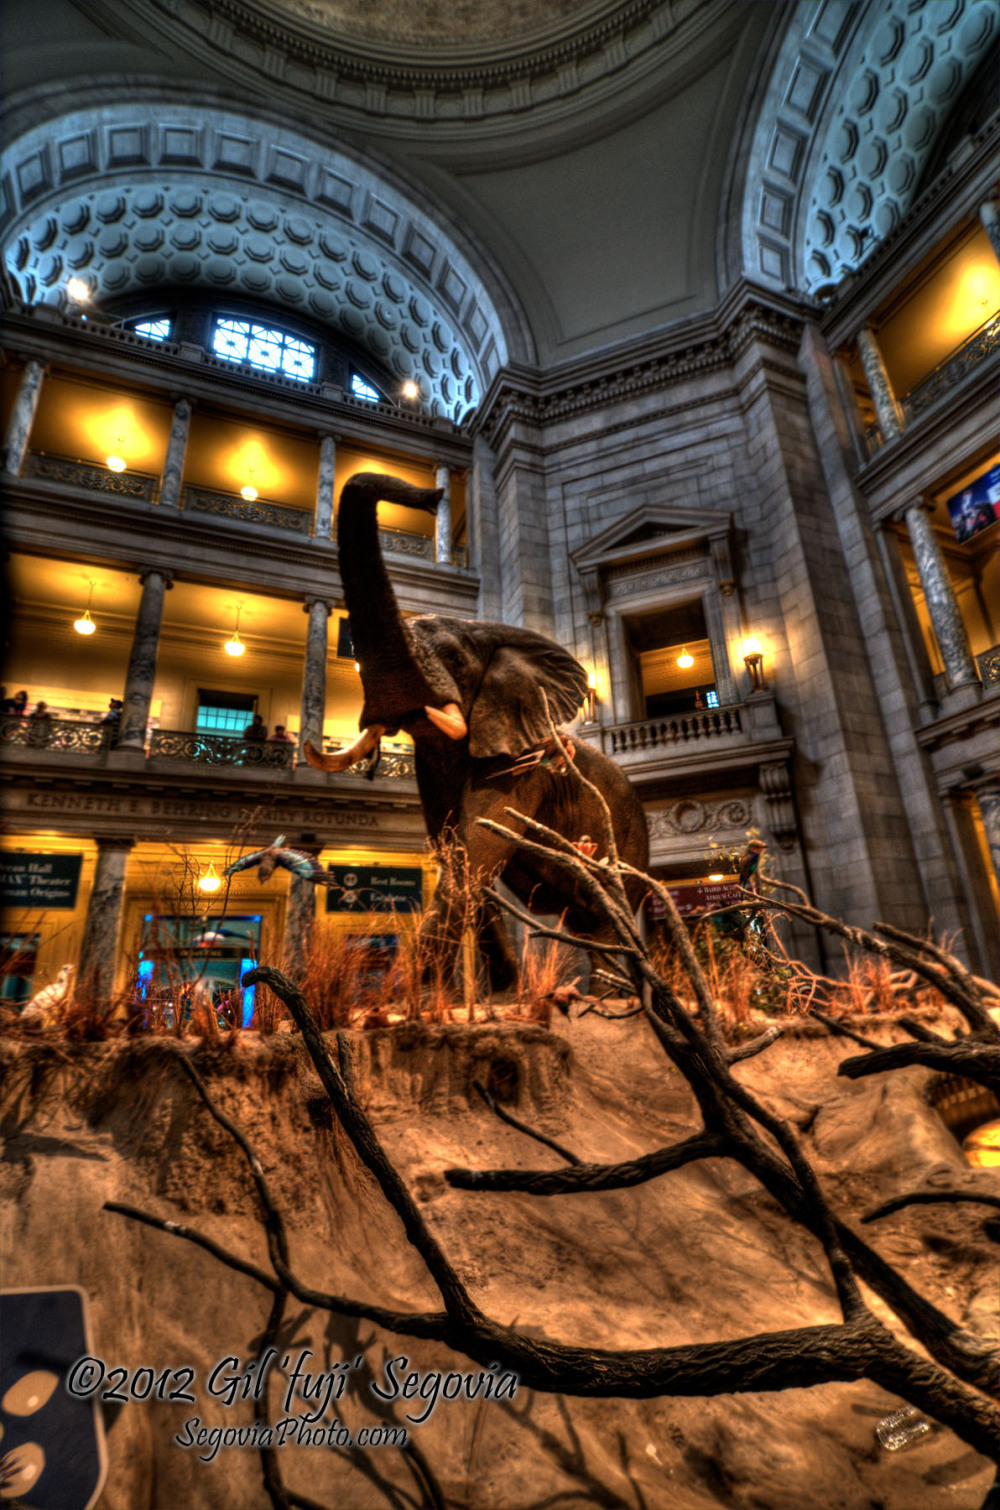 Elephantine Greeting at the Smithsonian